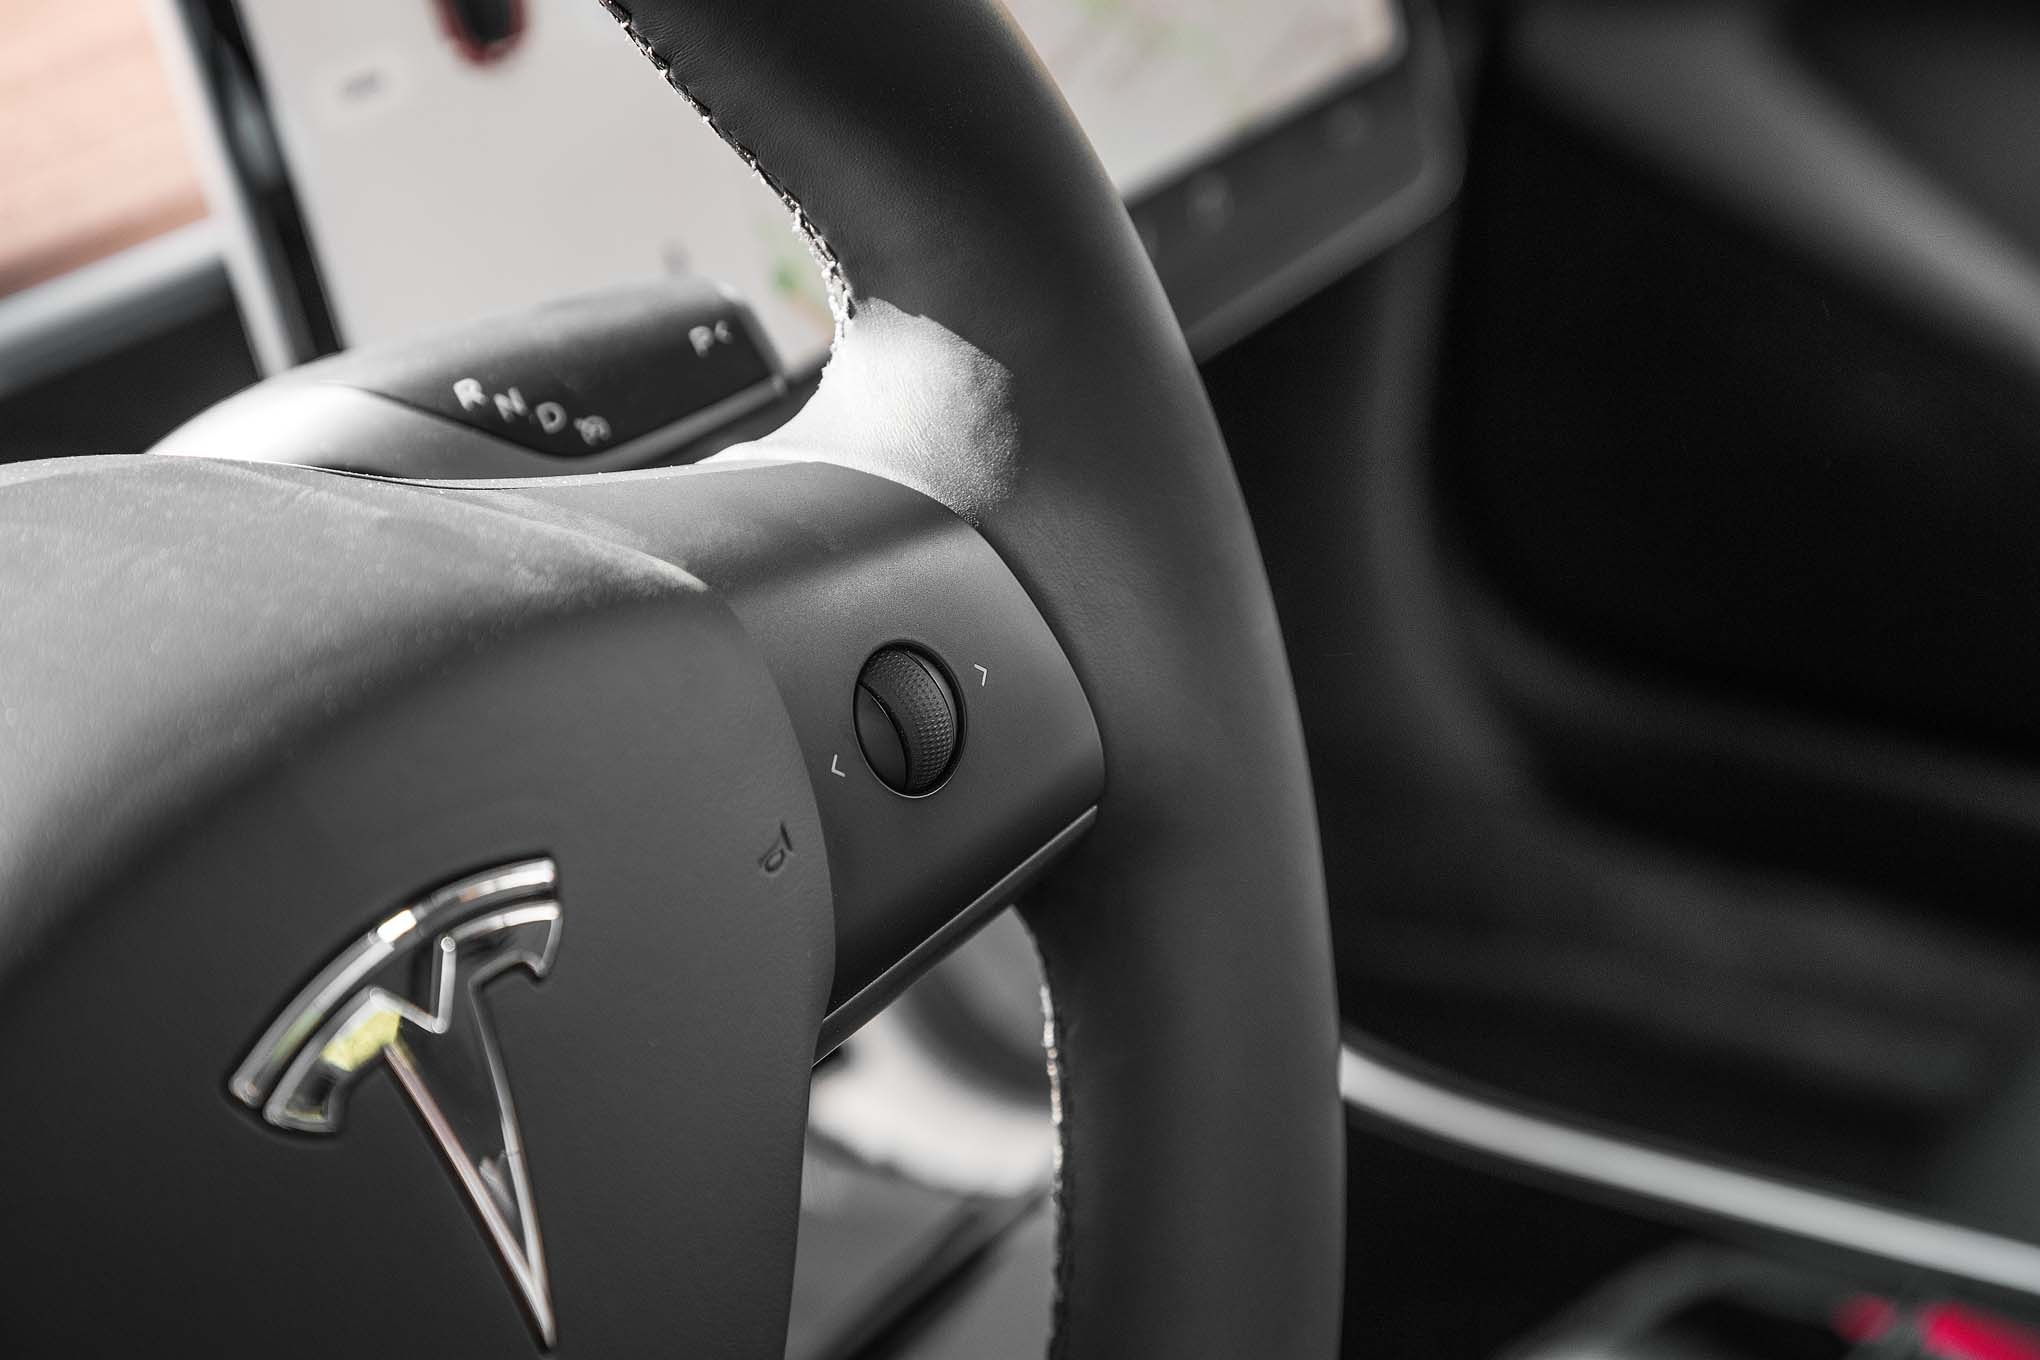 Tesla-Model-3-volume-steering-wheel-controls-02 Breathtaking Lamborghini Countach Owners Manual Pdf Cars Trend